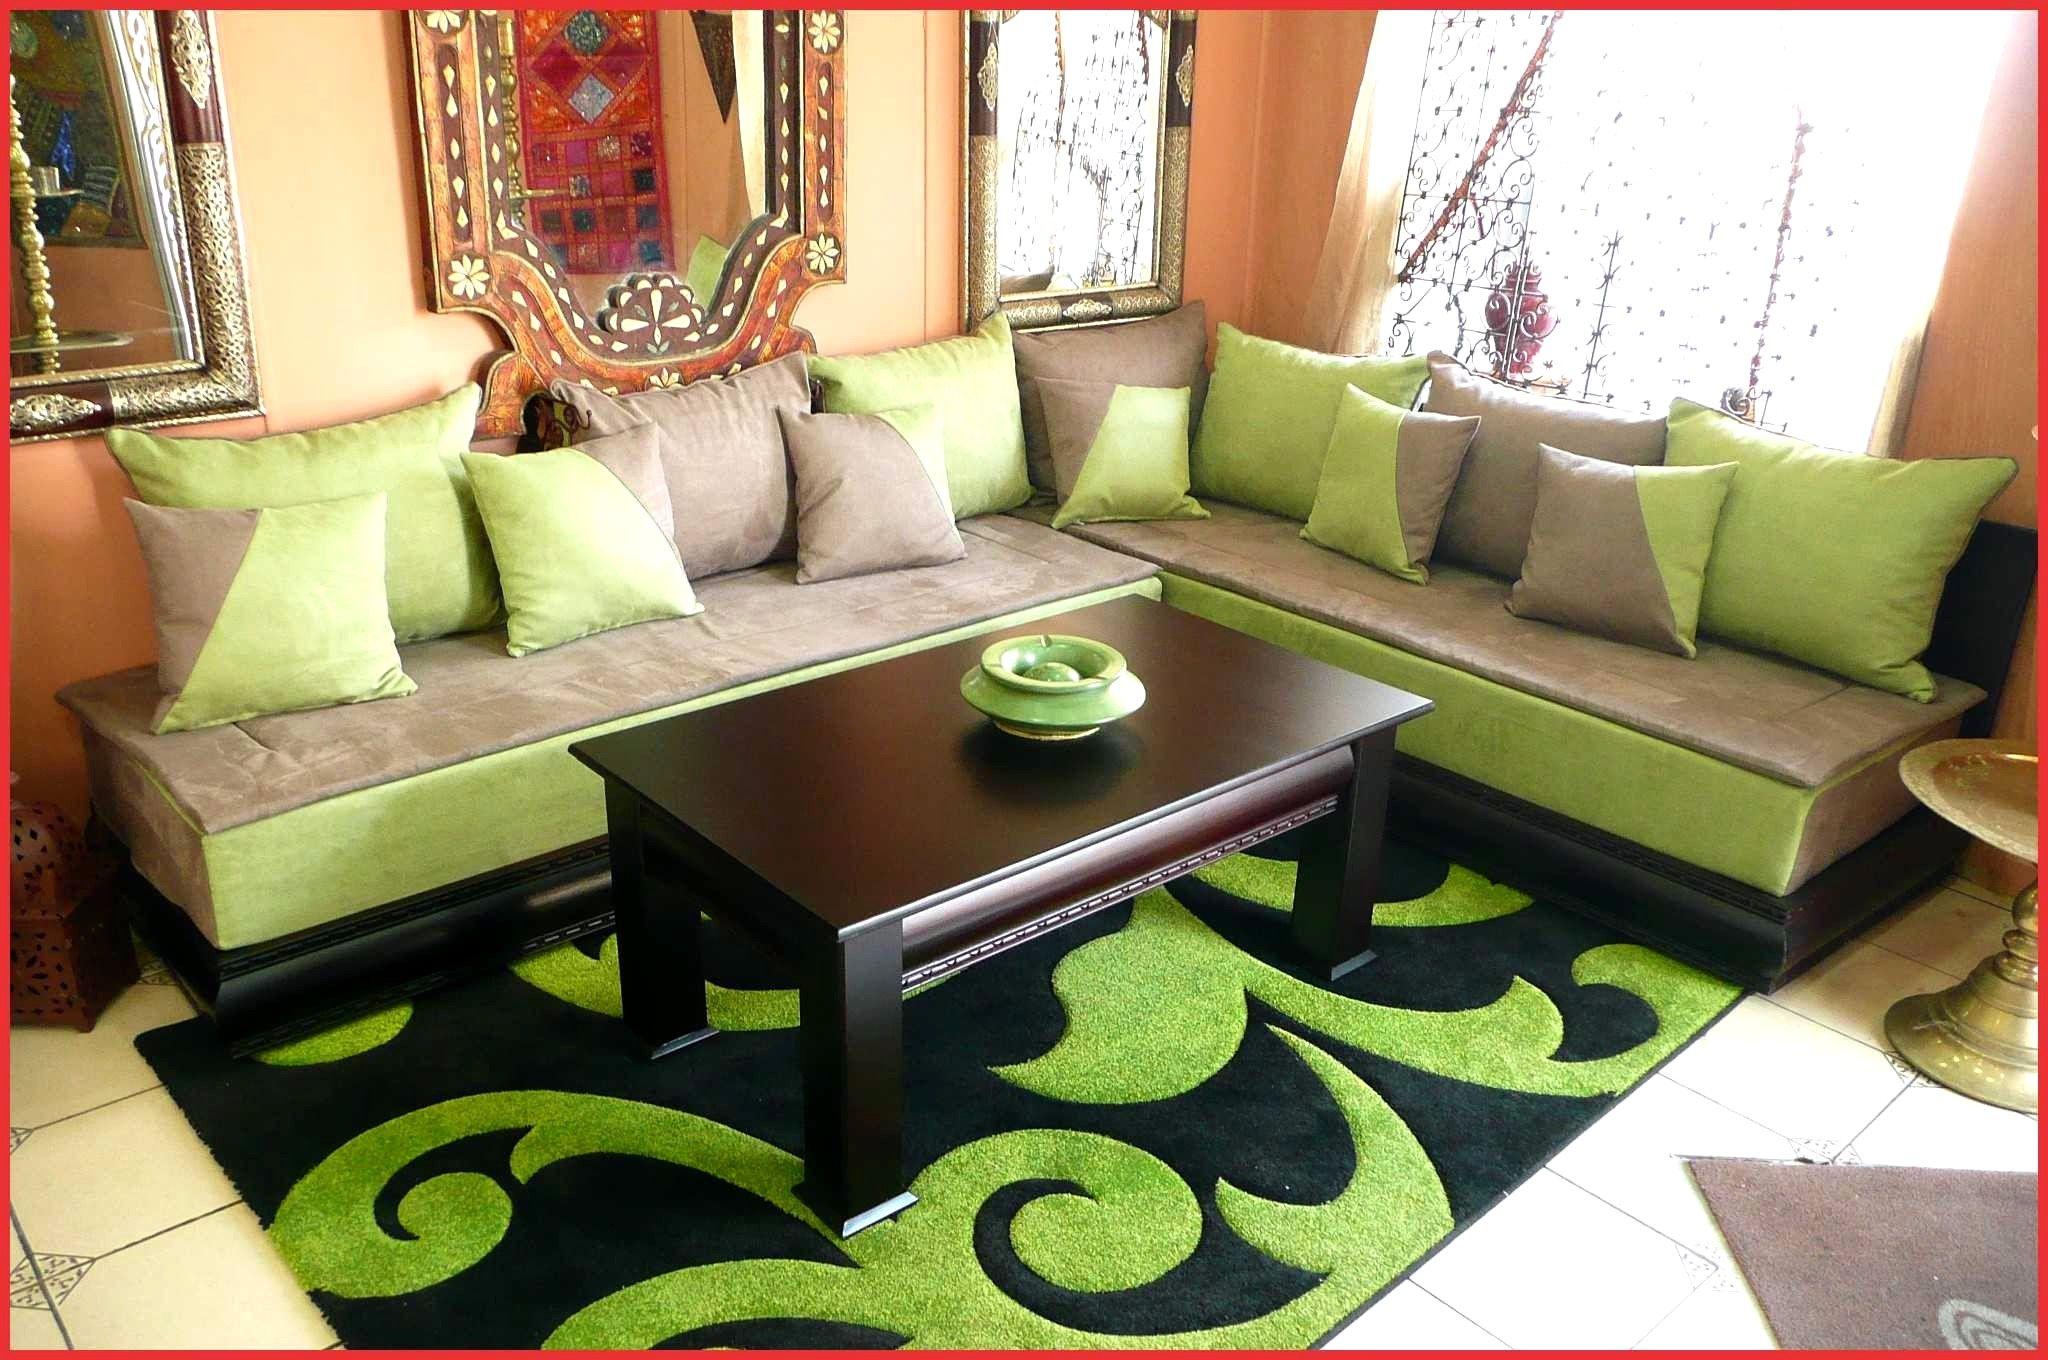 Salon Marocain Moderne Clermont Ferrand In 2020 Moroccan Living Room Living Room Decor Home Decor